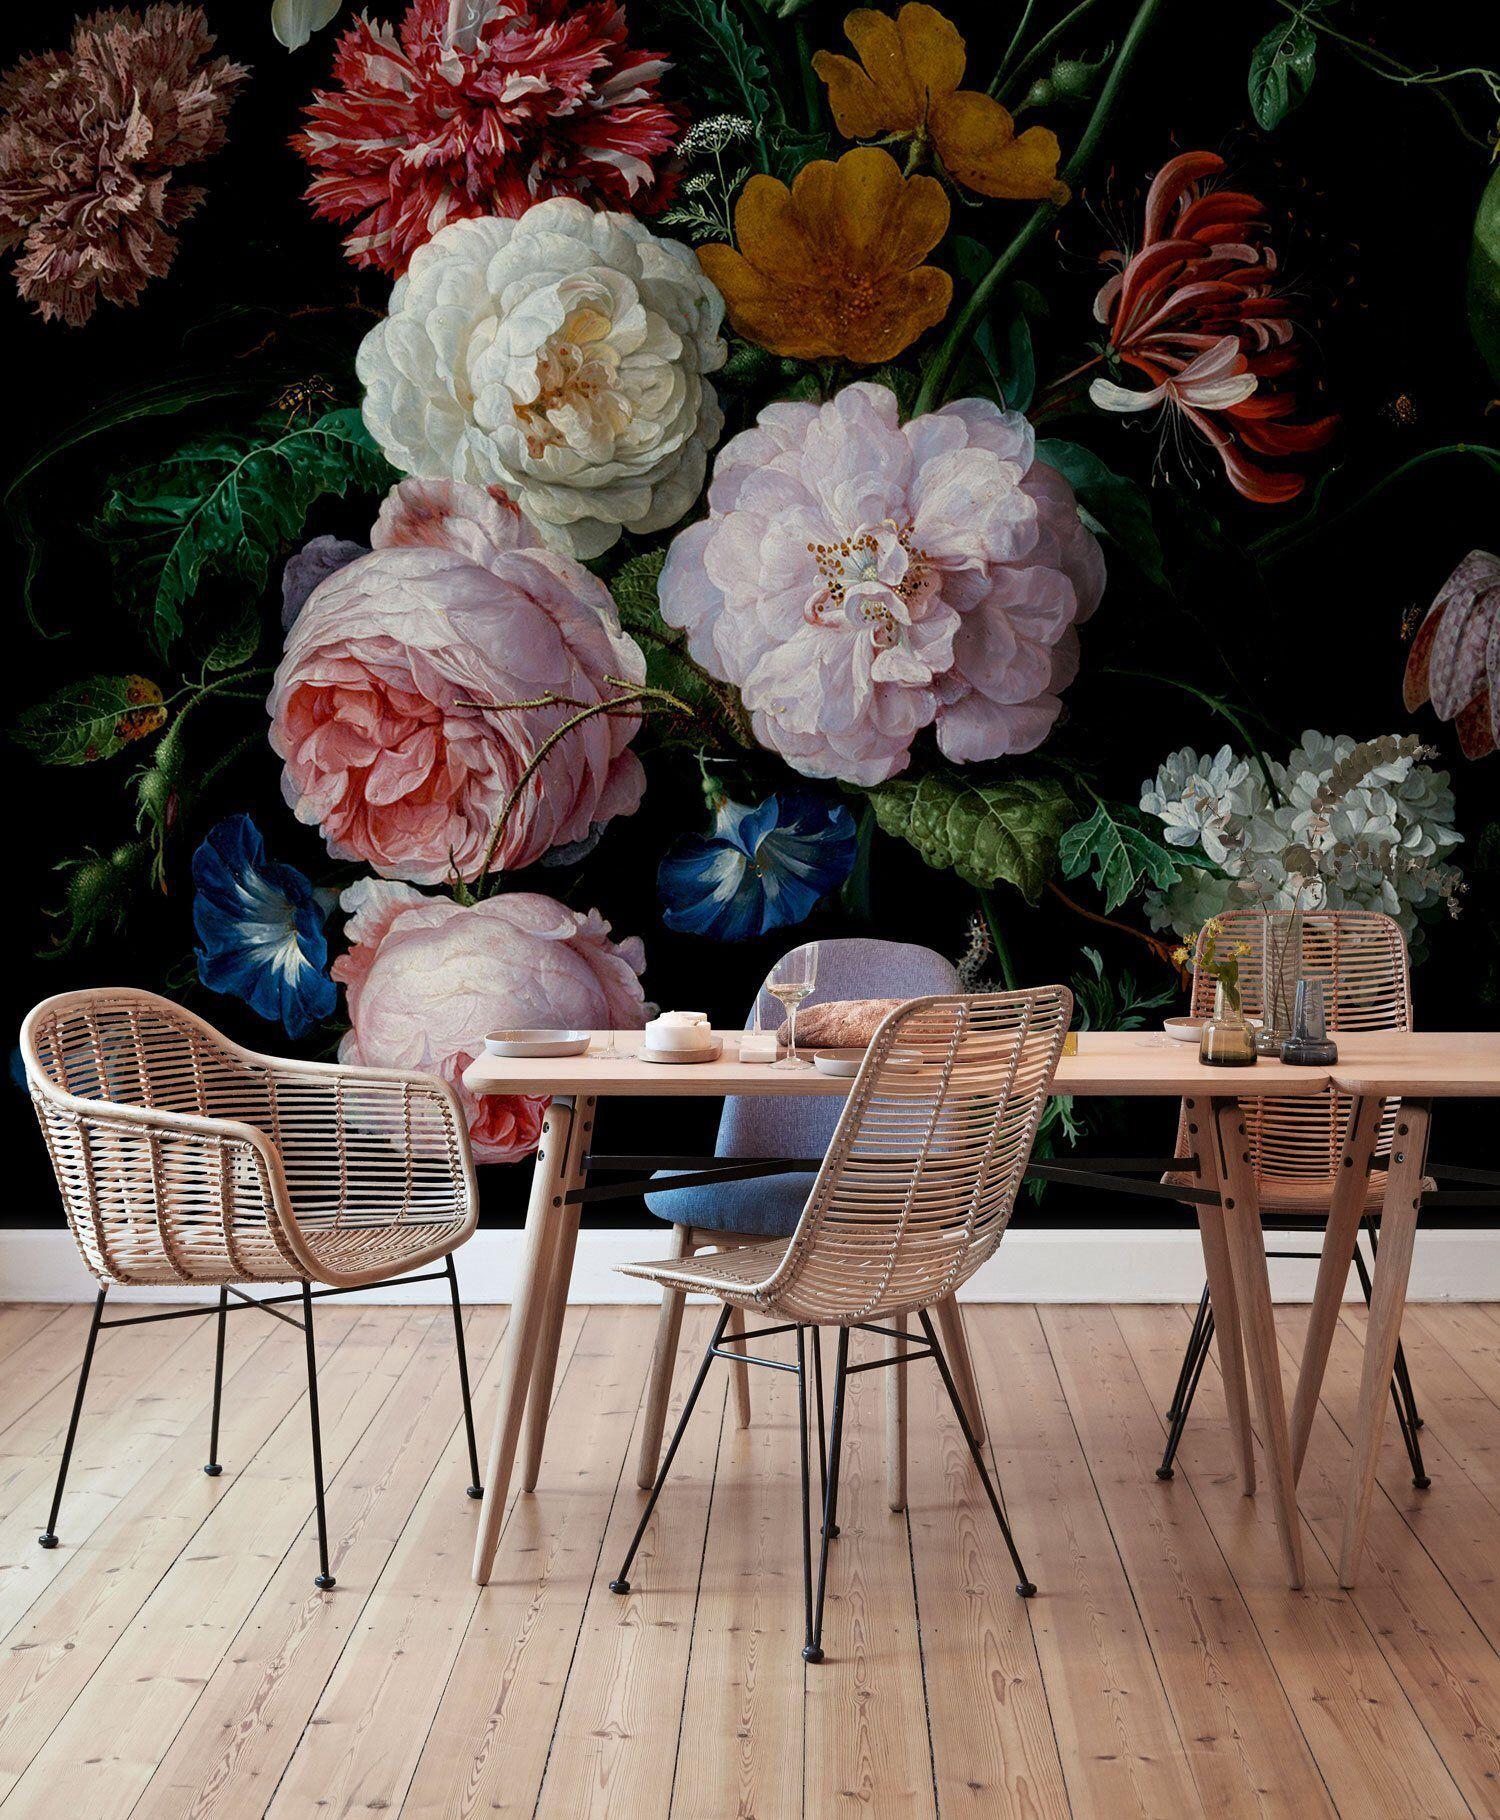 Tapete Fototapete Blumen Strauss Floral Pfingstrose Vintage